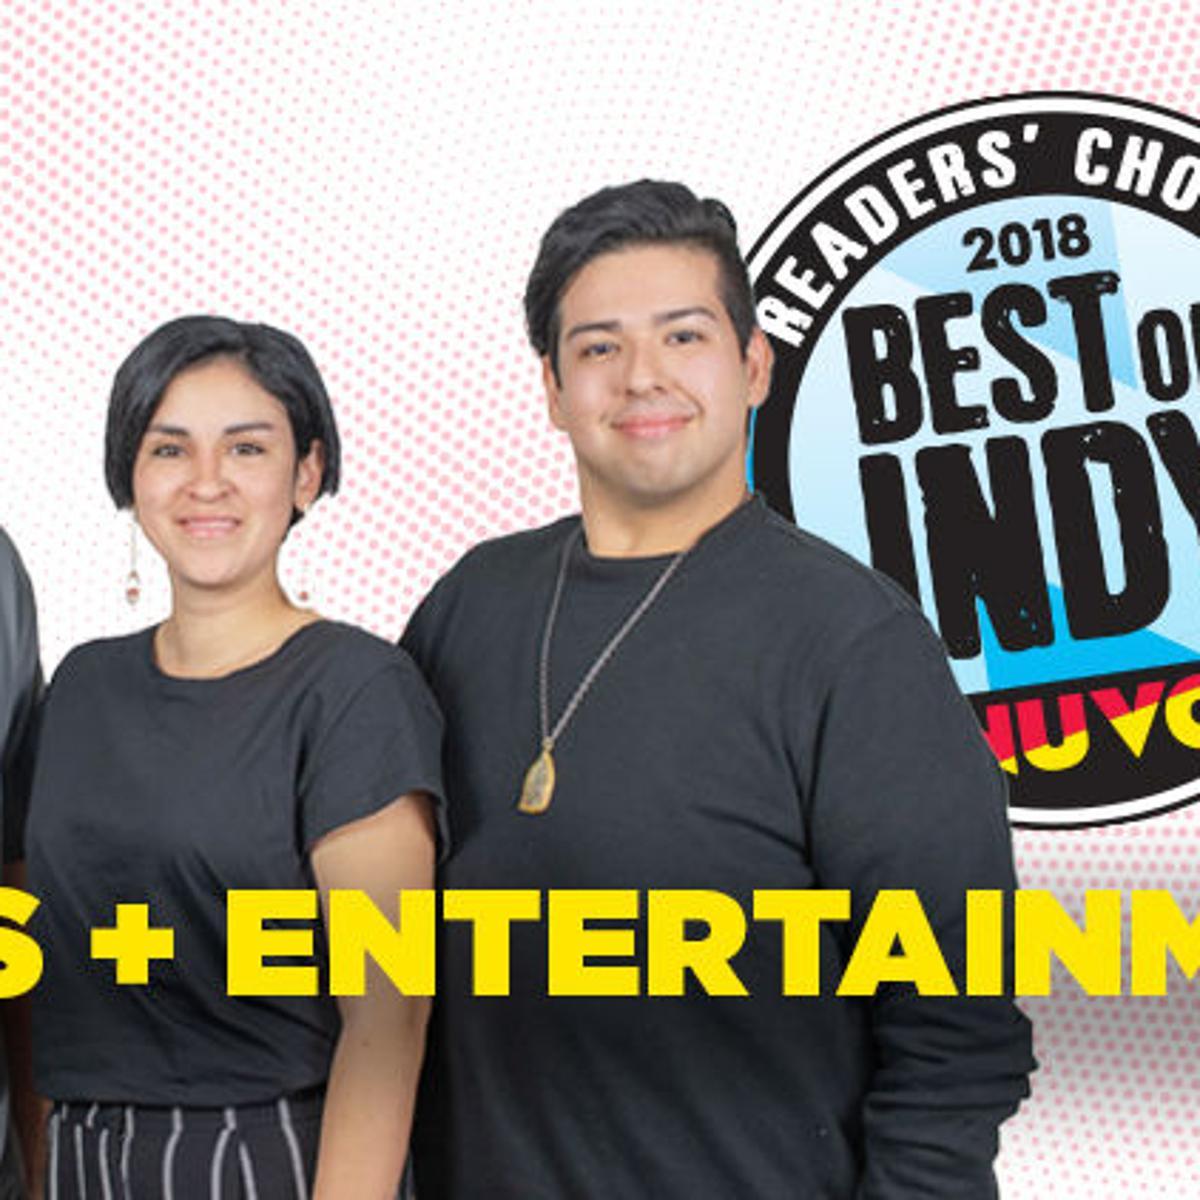 Best of Indy 2018: Arts + Entertainment | Bestofindy | nuvo net